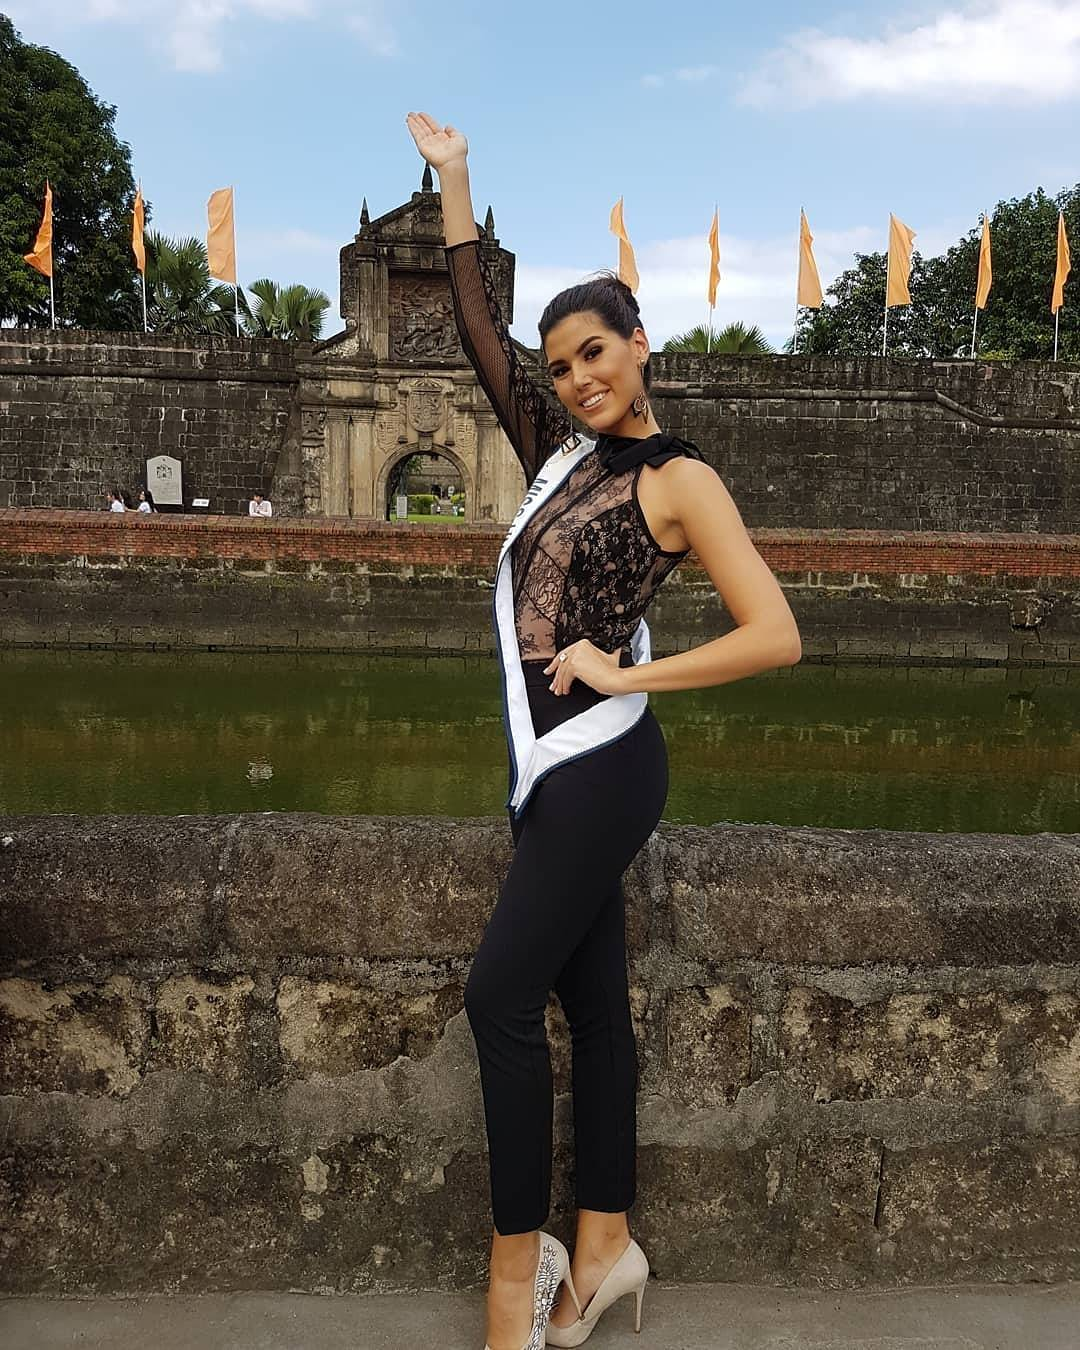 sofia del prado, reyna hispanoamericana 2015, top 10 de miss universe 2017. - Página 14 25007310